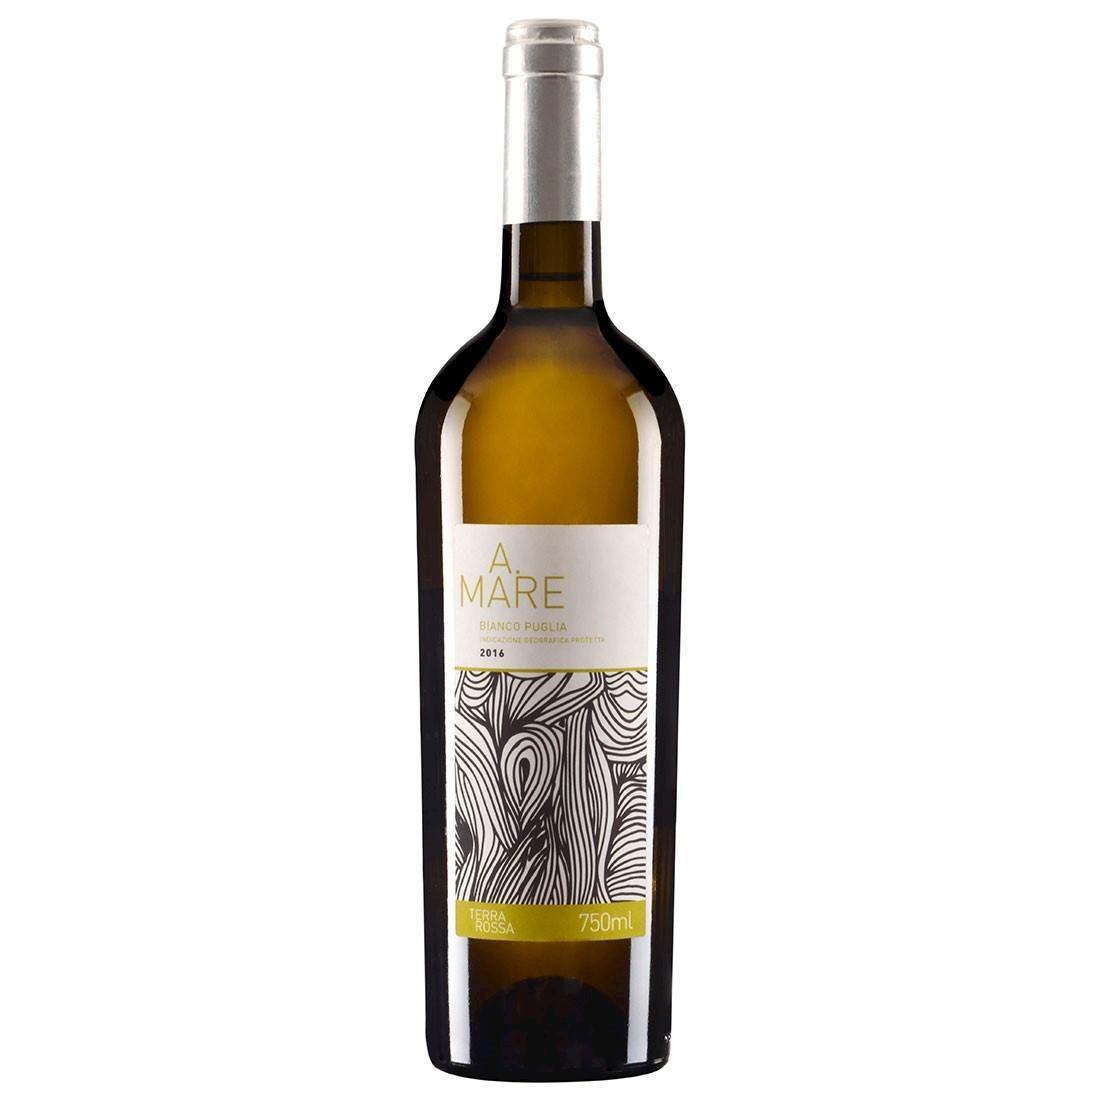 Vinho Italiano A.Mare Bianco Puglia IGP 2016 (750ml)